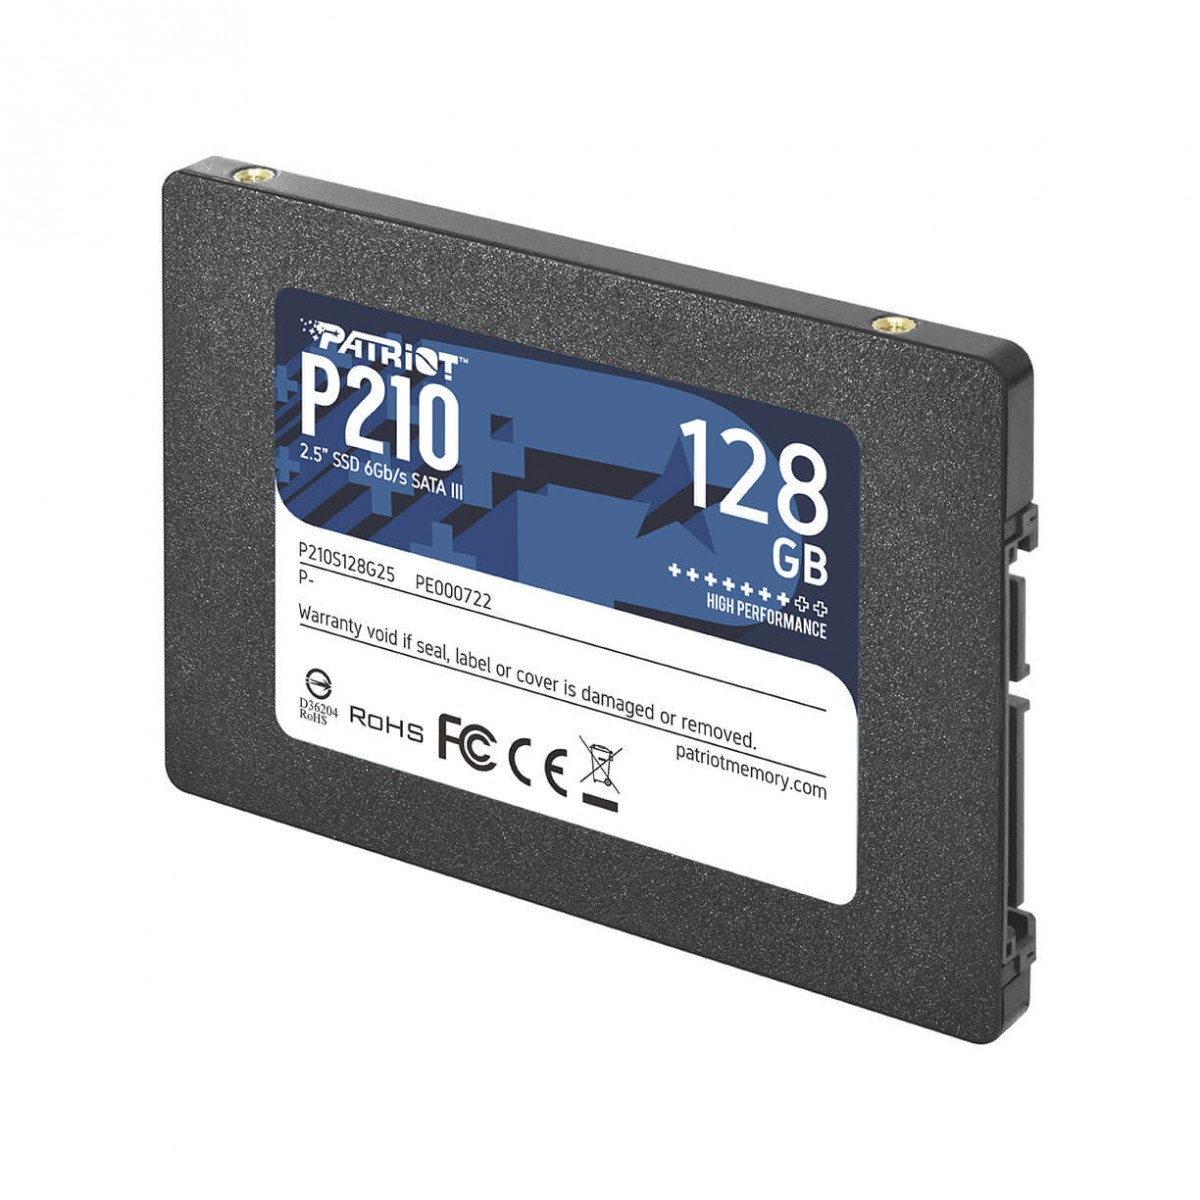 SSD Patriot P210, 128GB, Sata III, Leitura 500MB/s e Gravação 400MB/s - P210S128G25